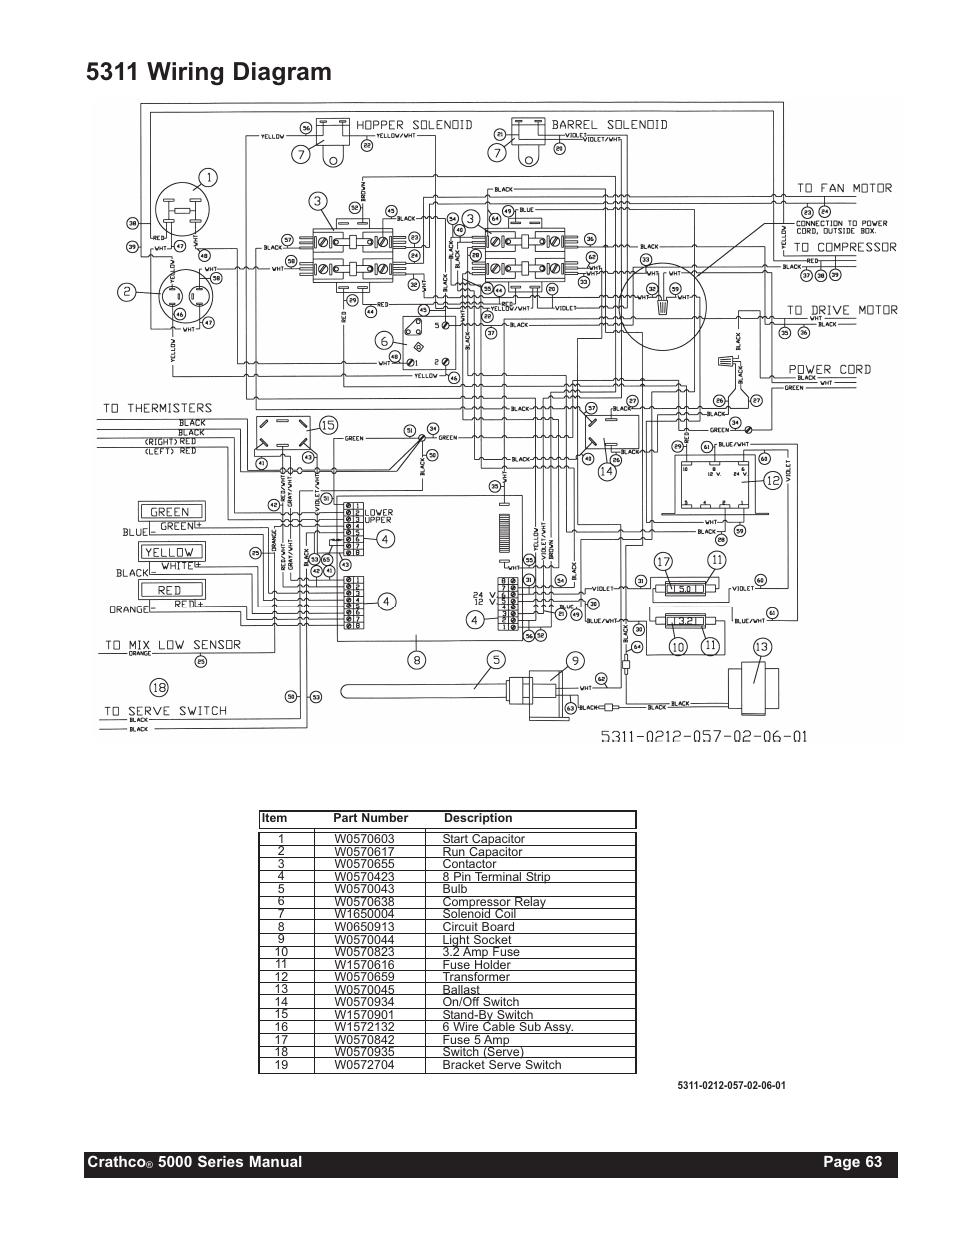 5311 Wiring Diagram Grindmaster Crathco 5941 User Manual Page 63 3 Terminal Solenoid 72